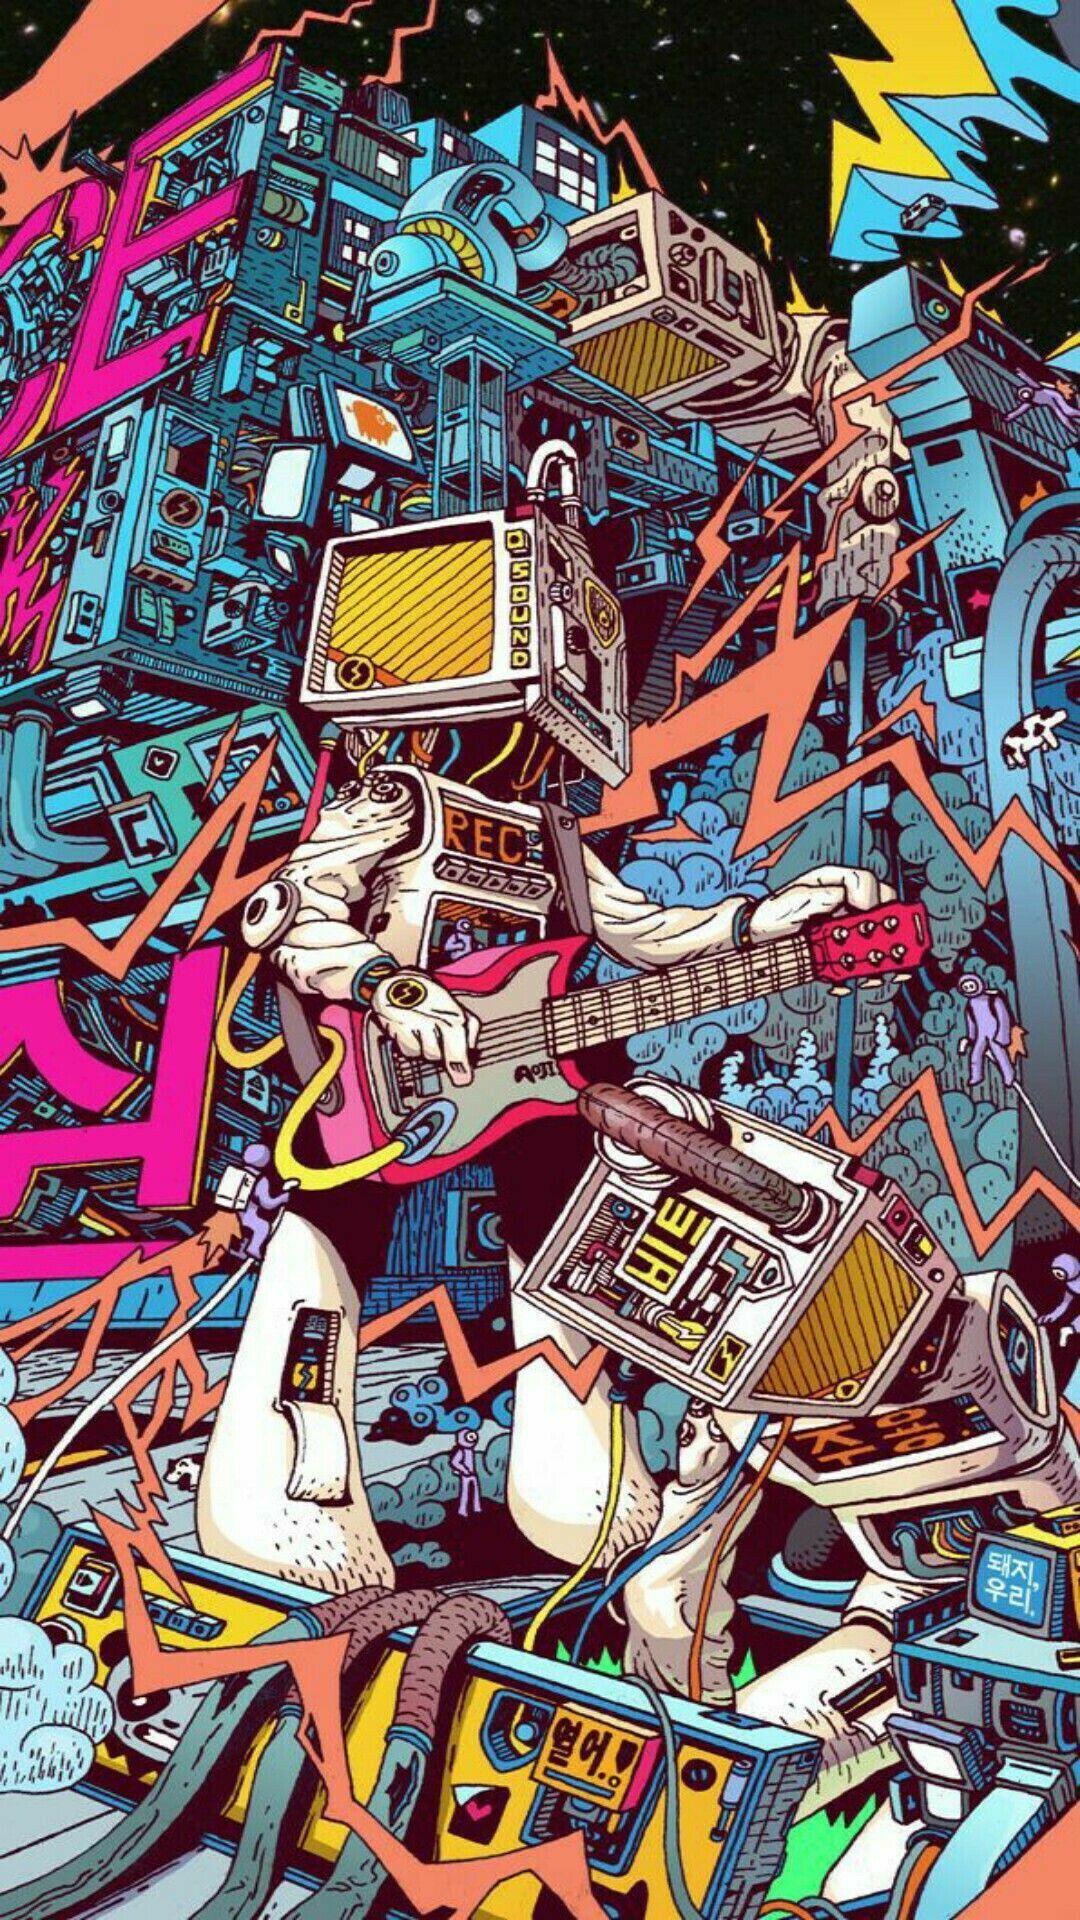 graffiti robot wallpaper in 2020 Psychedelic art, Art